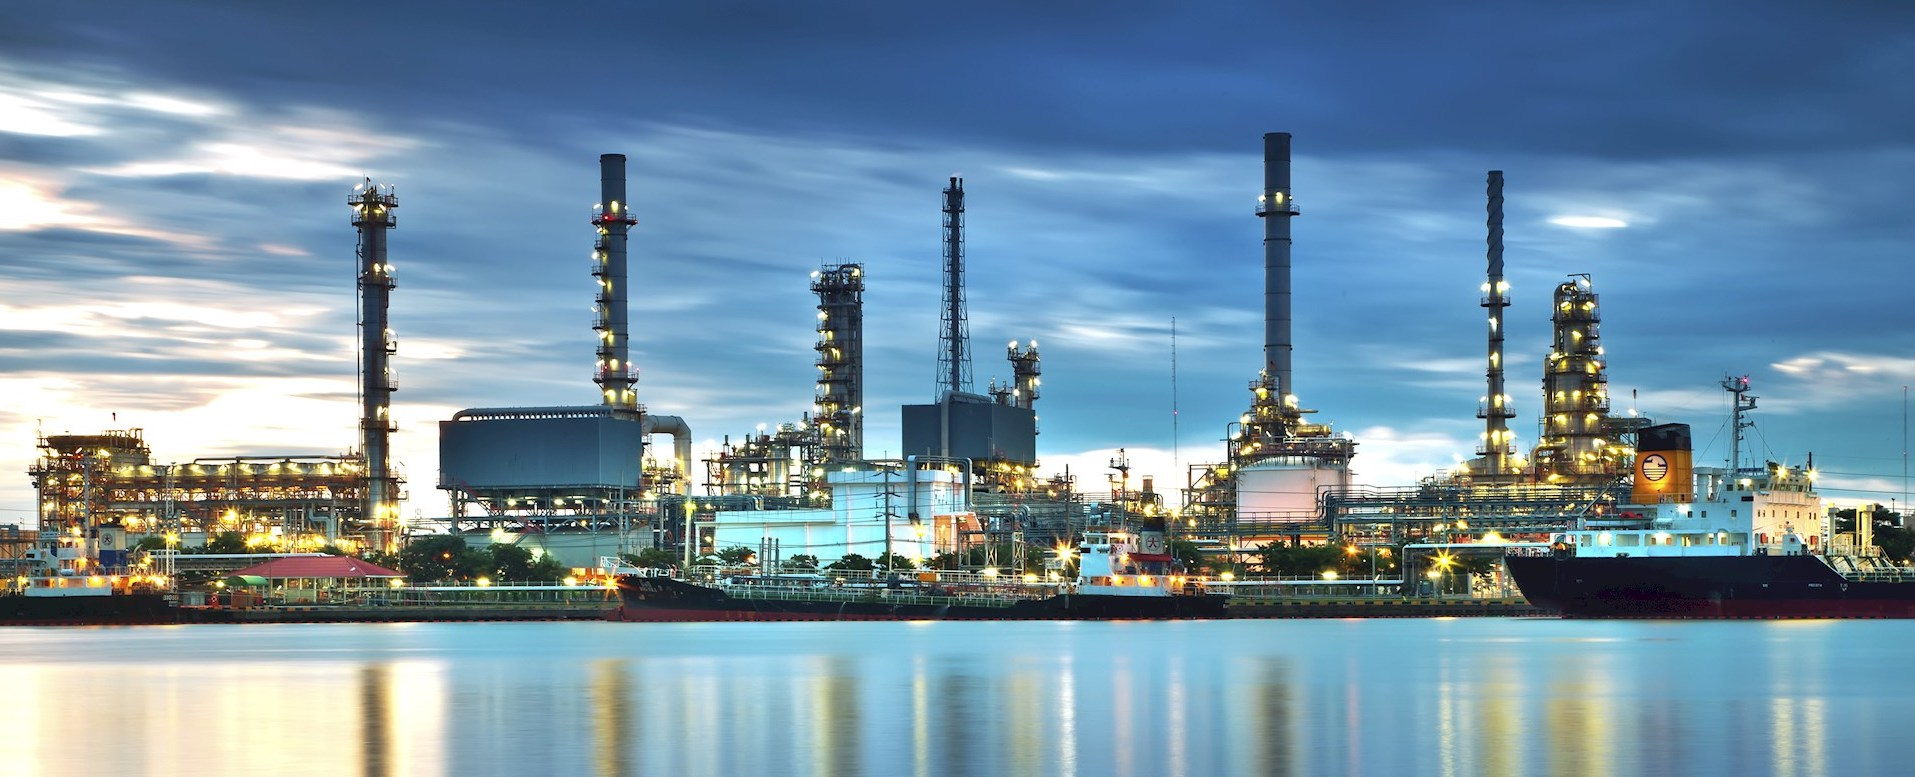 {00BF2FAF-F82C-4D2B-898E-ED8EC00EBBD1}Refinery image Oilgas.jpg